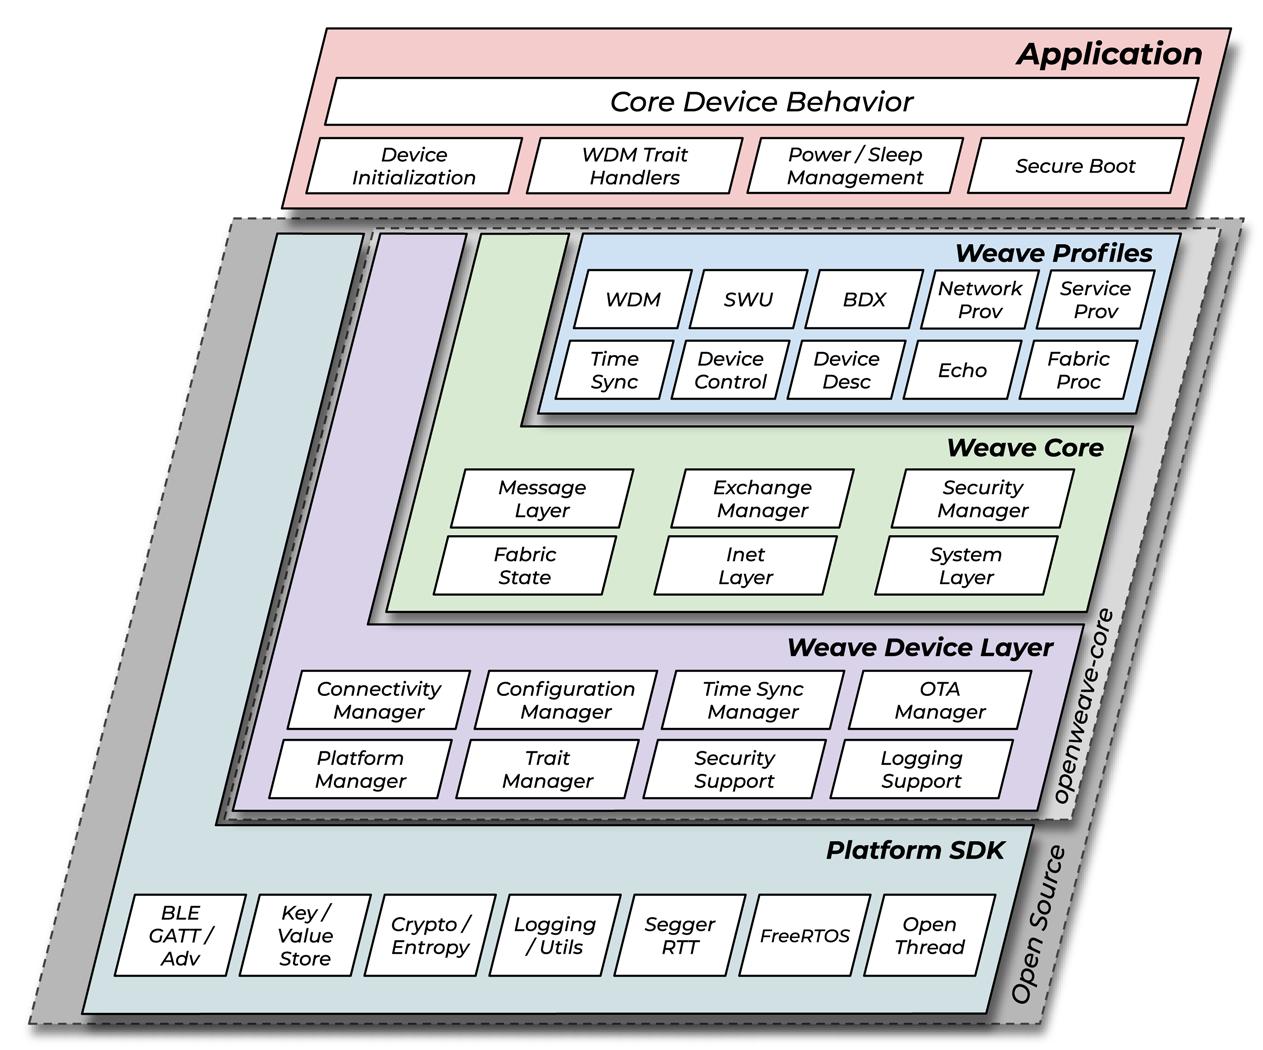 Arquitetura da camada de dispositivo OpenWeave